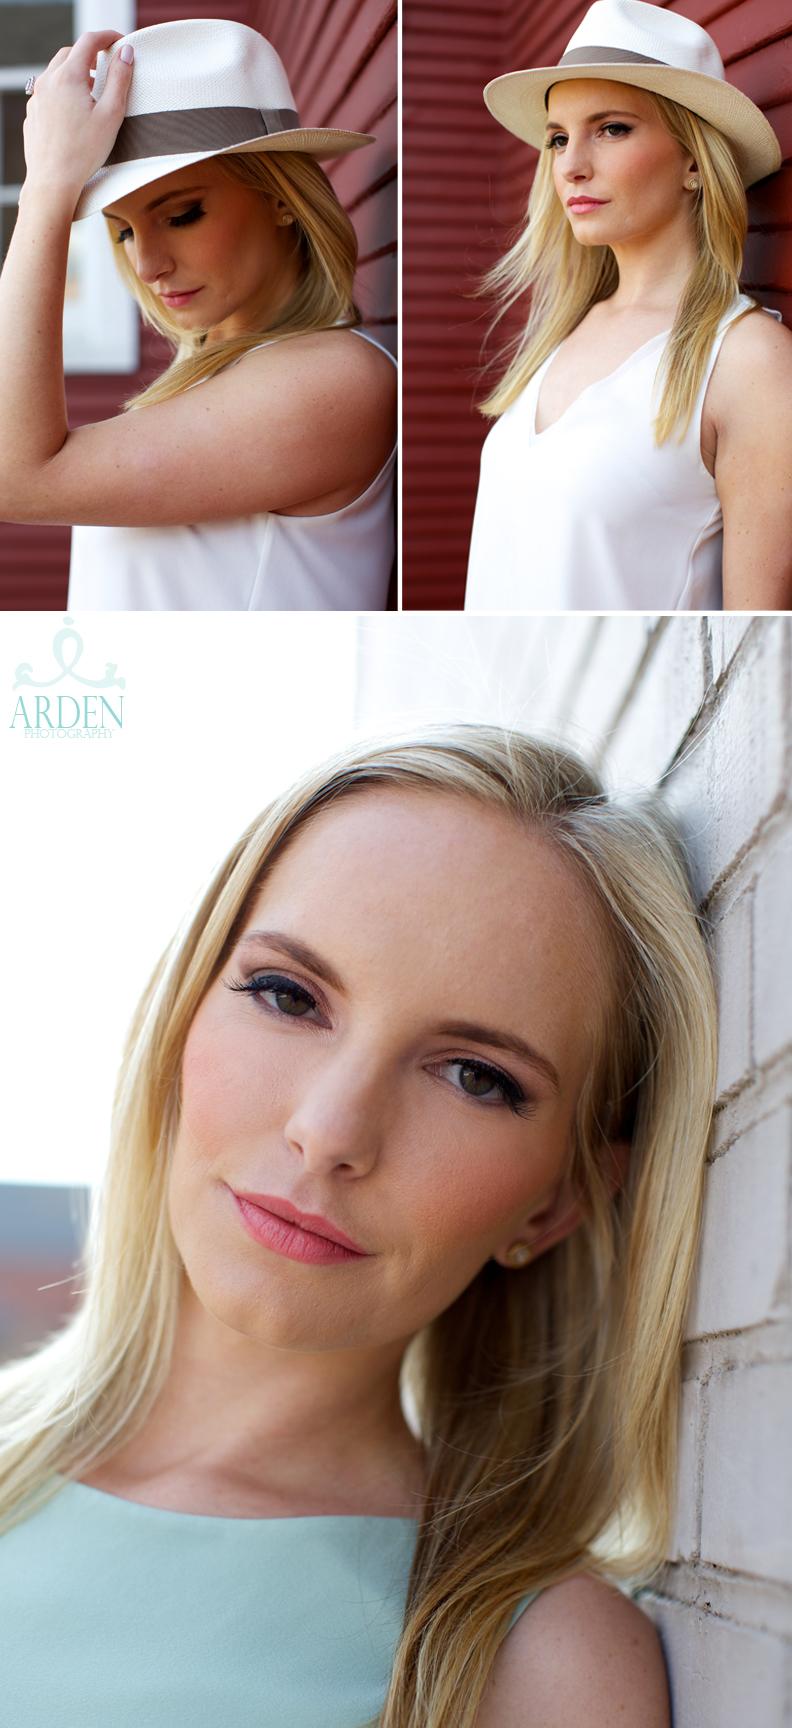 Sarah_Israel_Portraits_Arden_Photography3.jpg